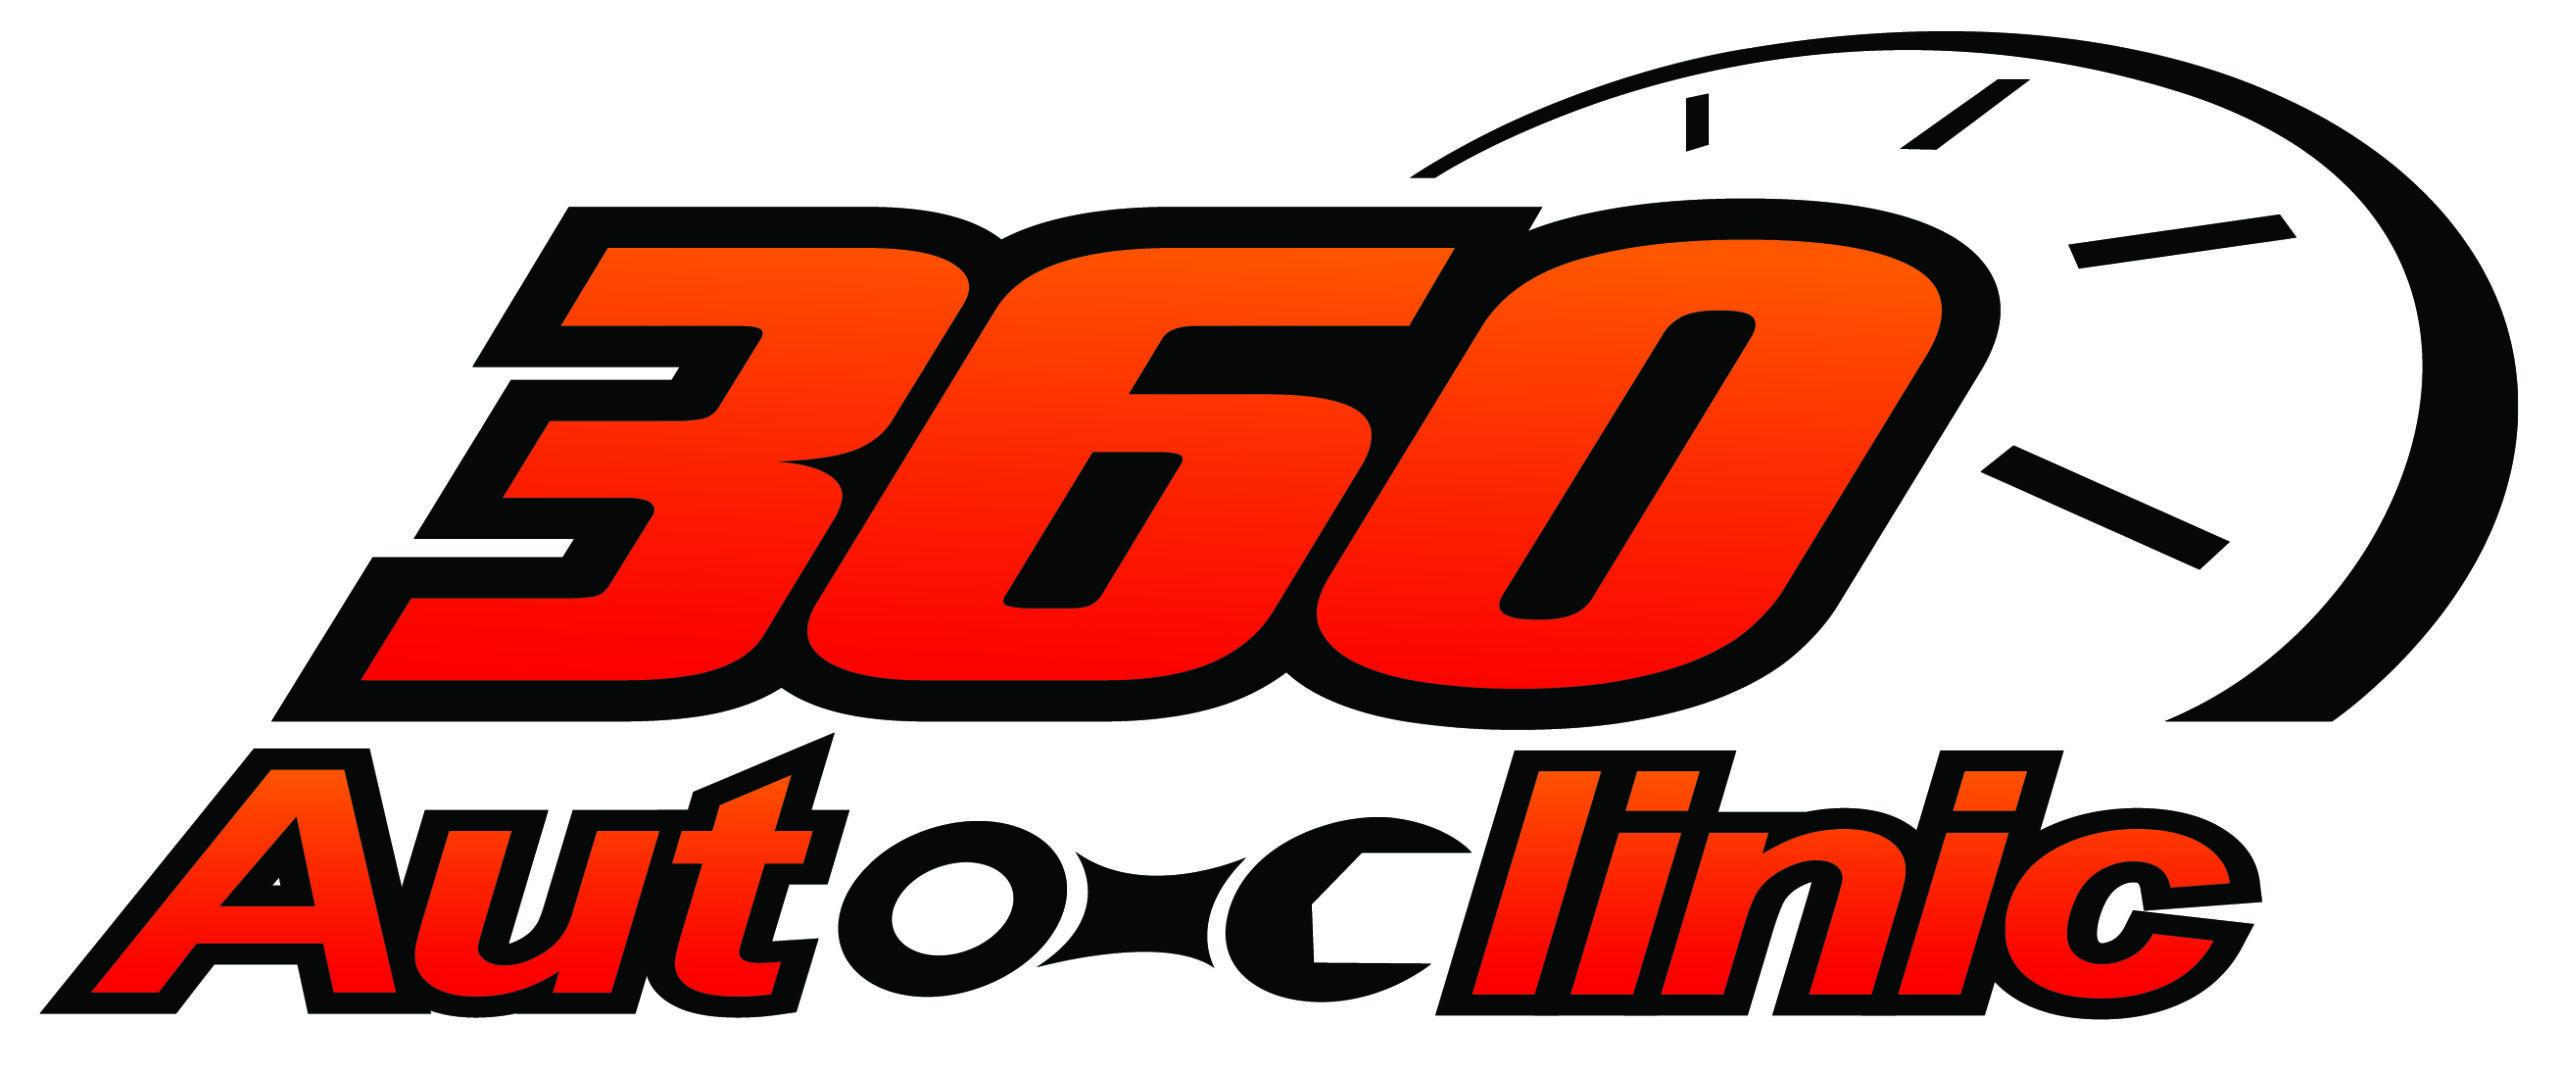 360 Auto Clinic